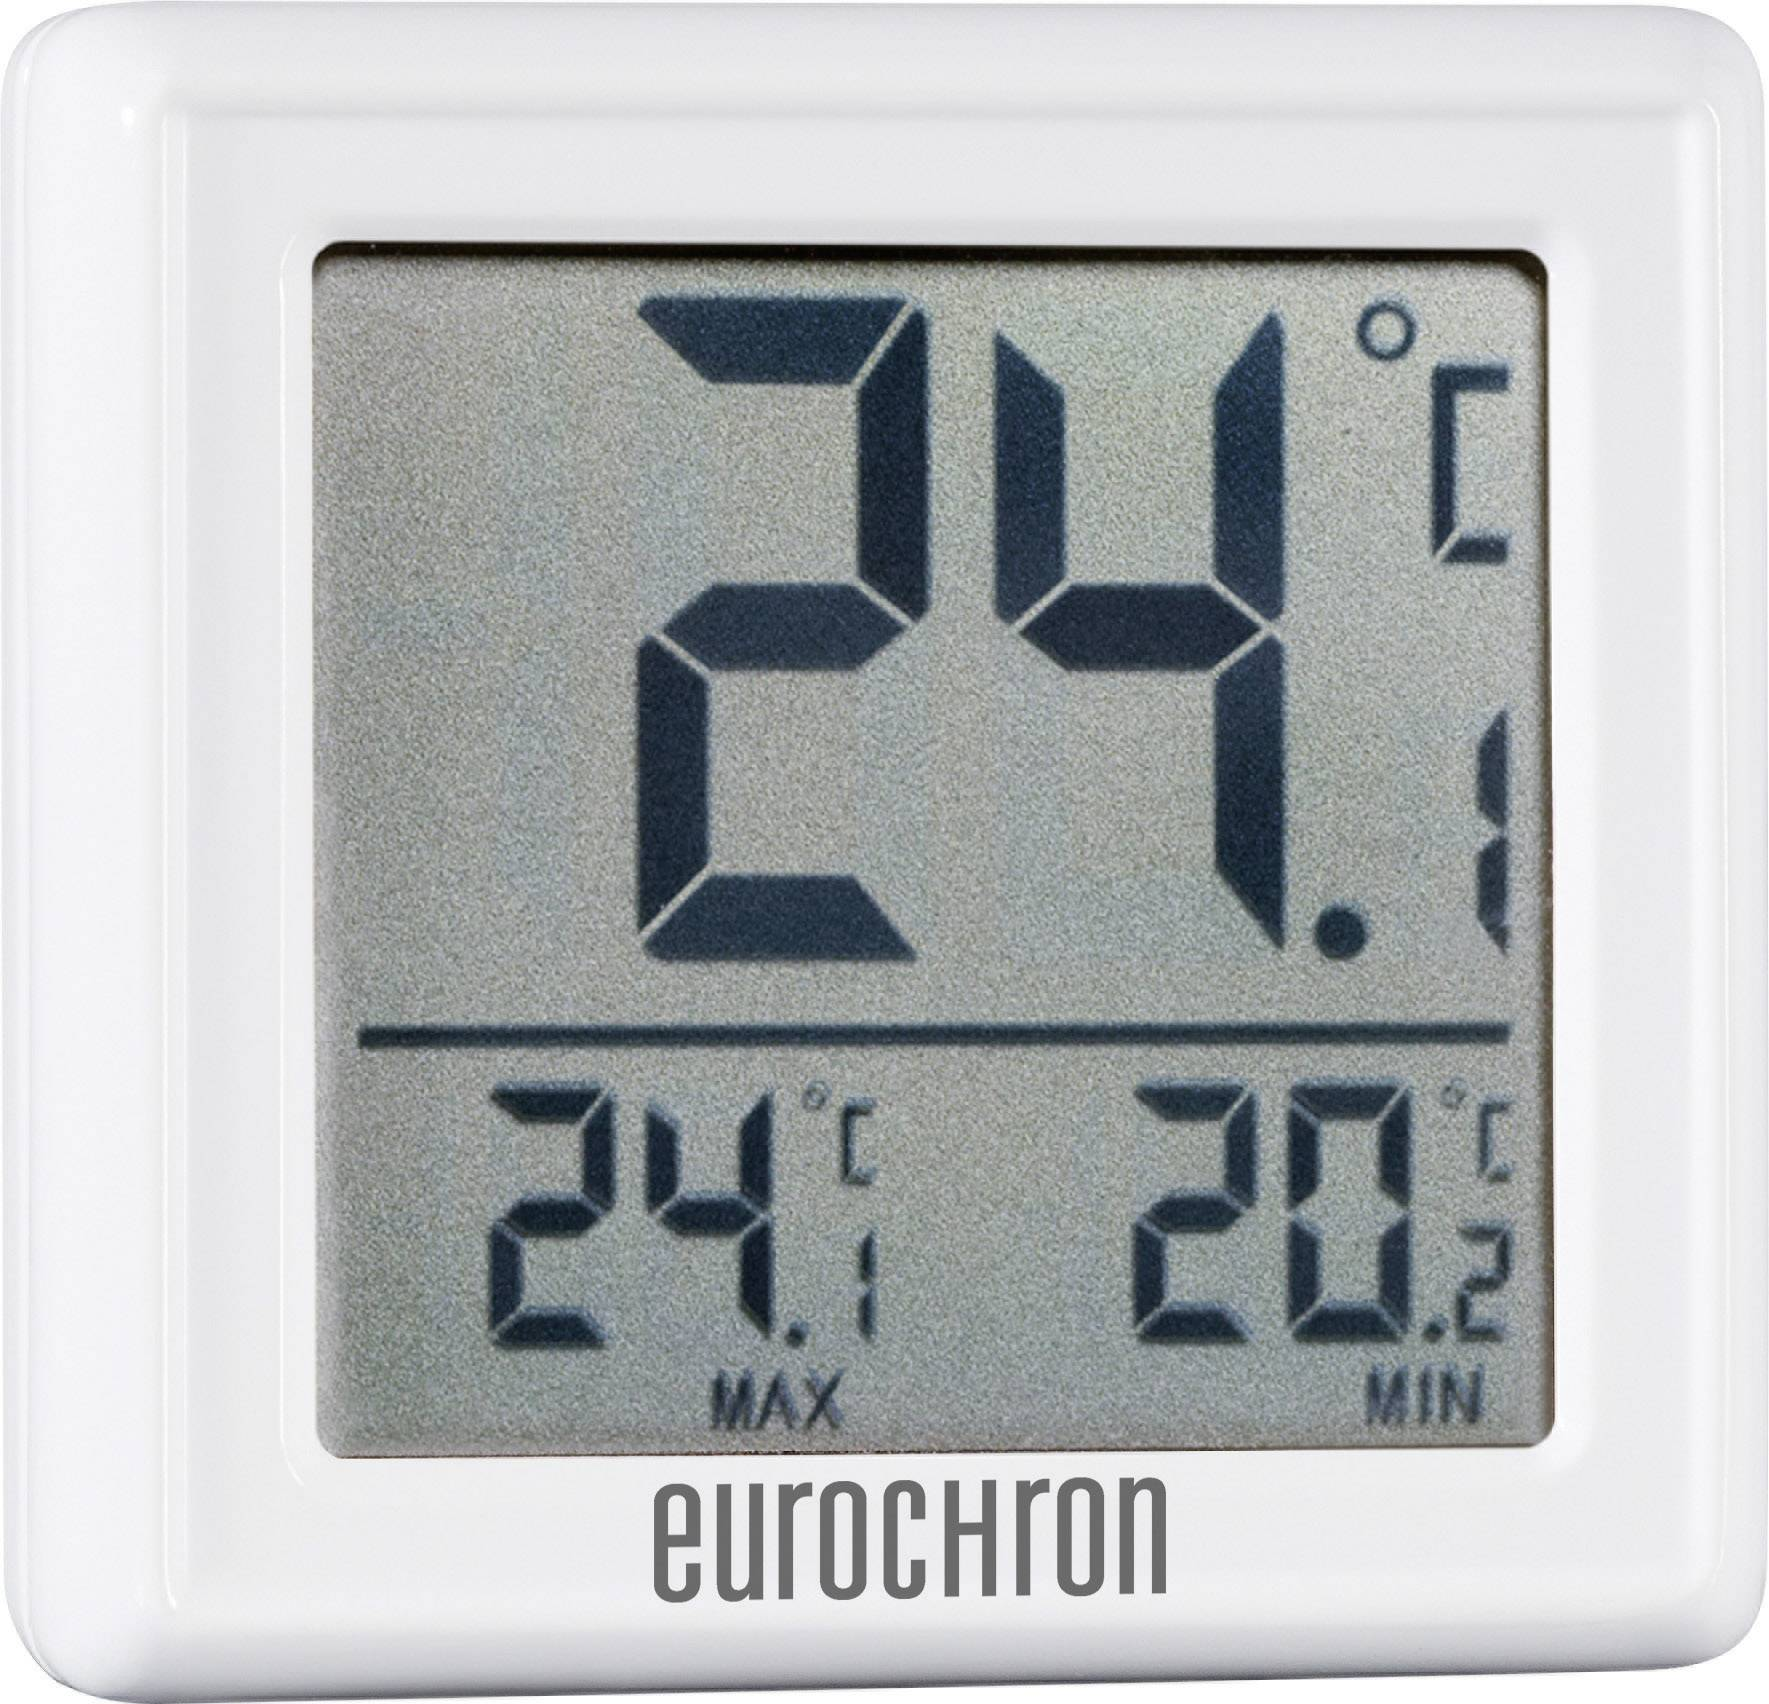 Mini teplomer, Eurochron ETH 5000